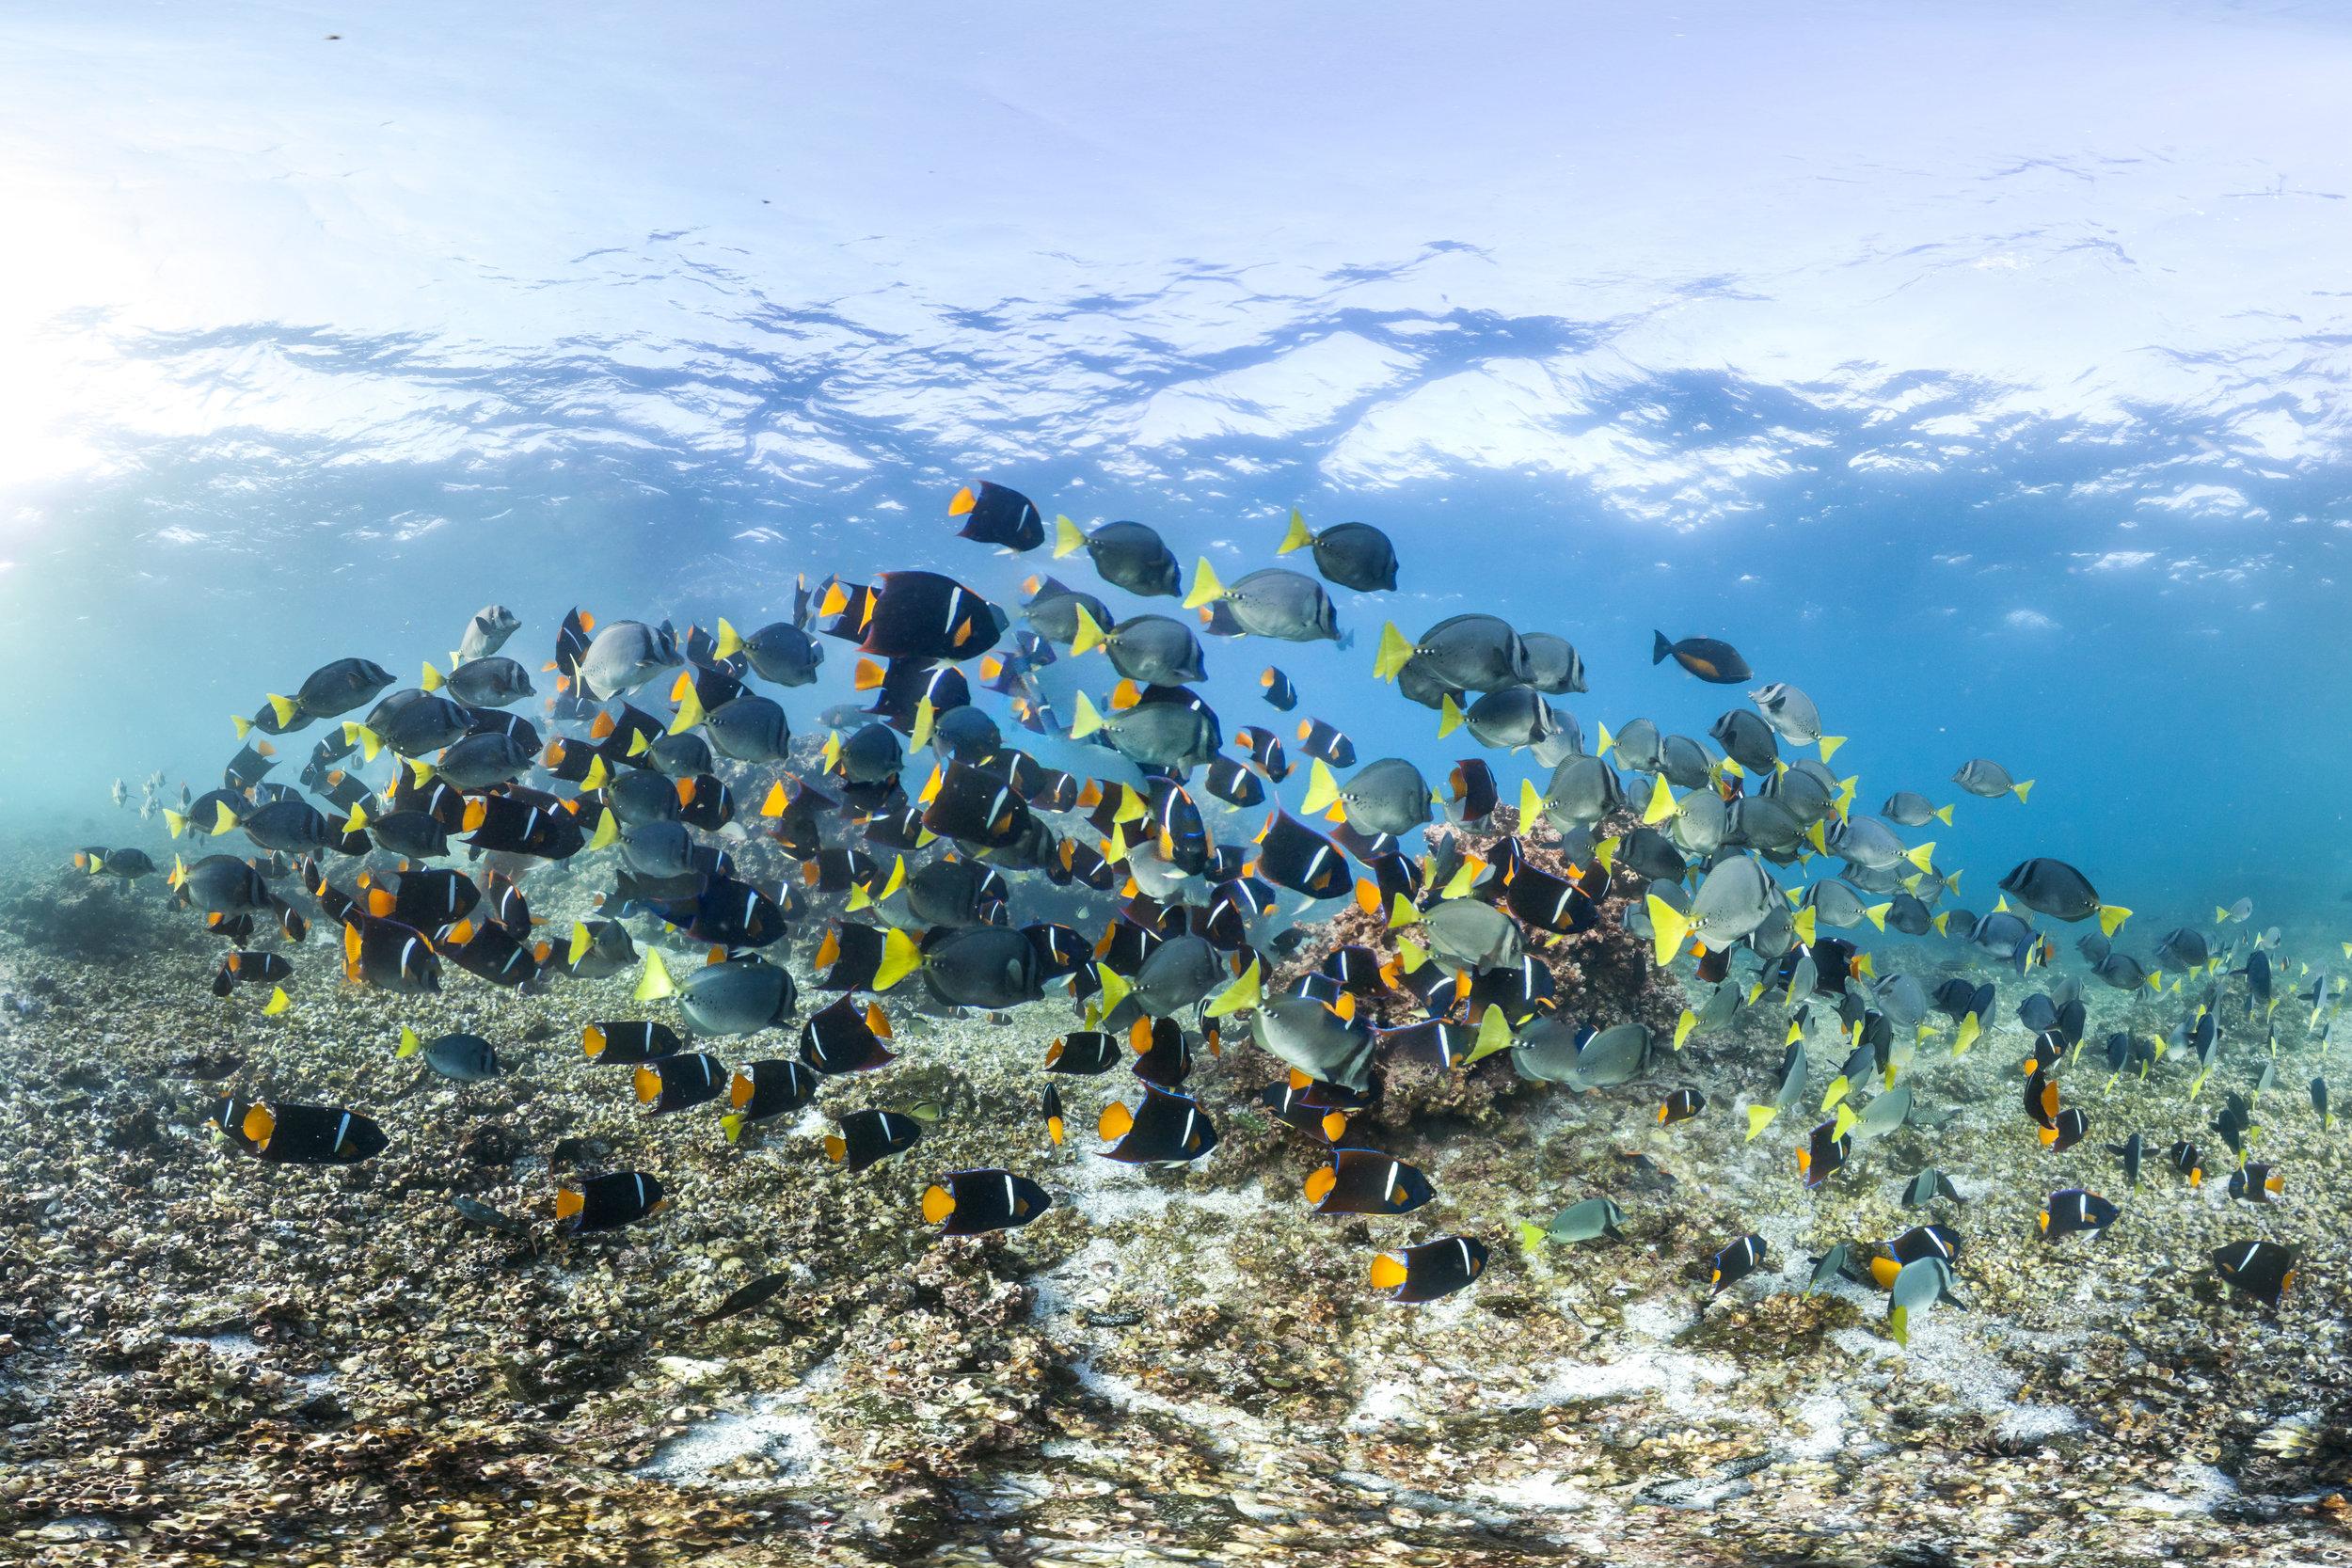 DEVILS CROWN, GALAPAGOS CREDIT: THE OCEAN AGENCY / XLCSS